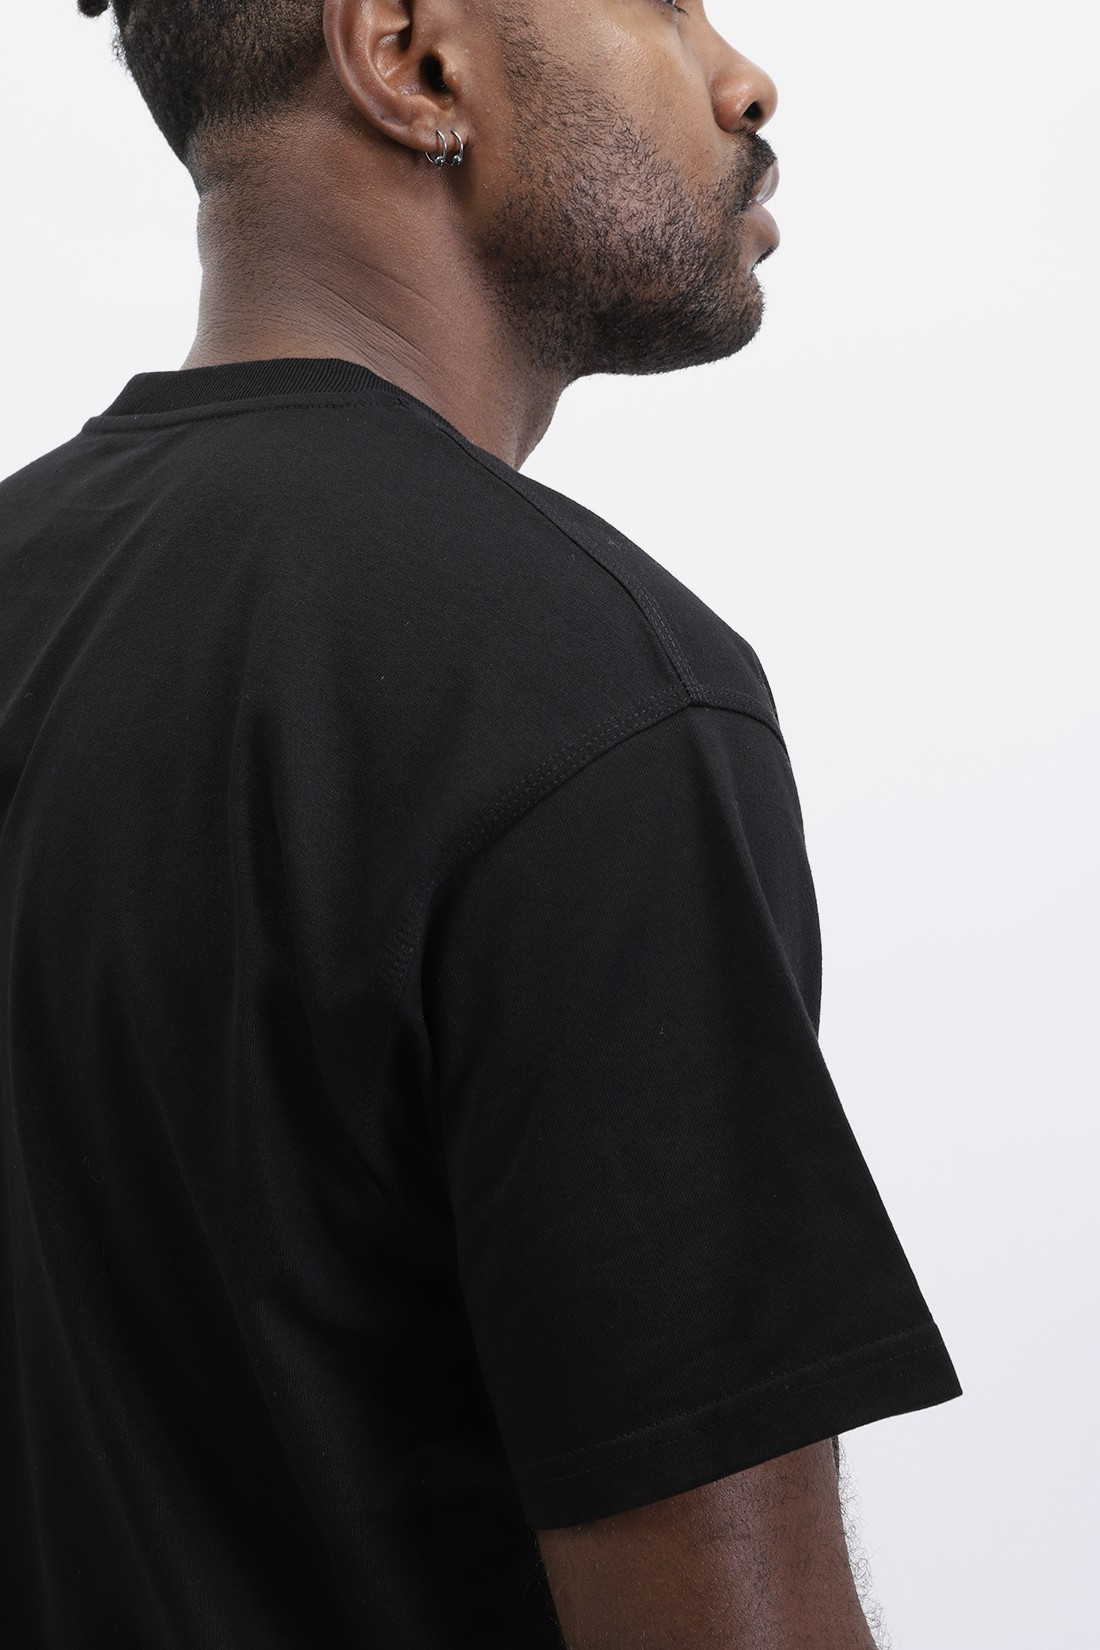 CARHARTT WIP / S/s american script t-shirt Black